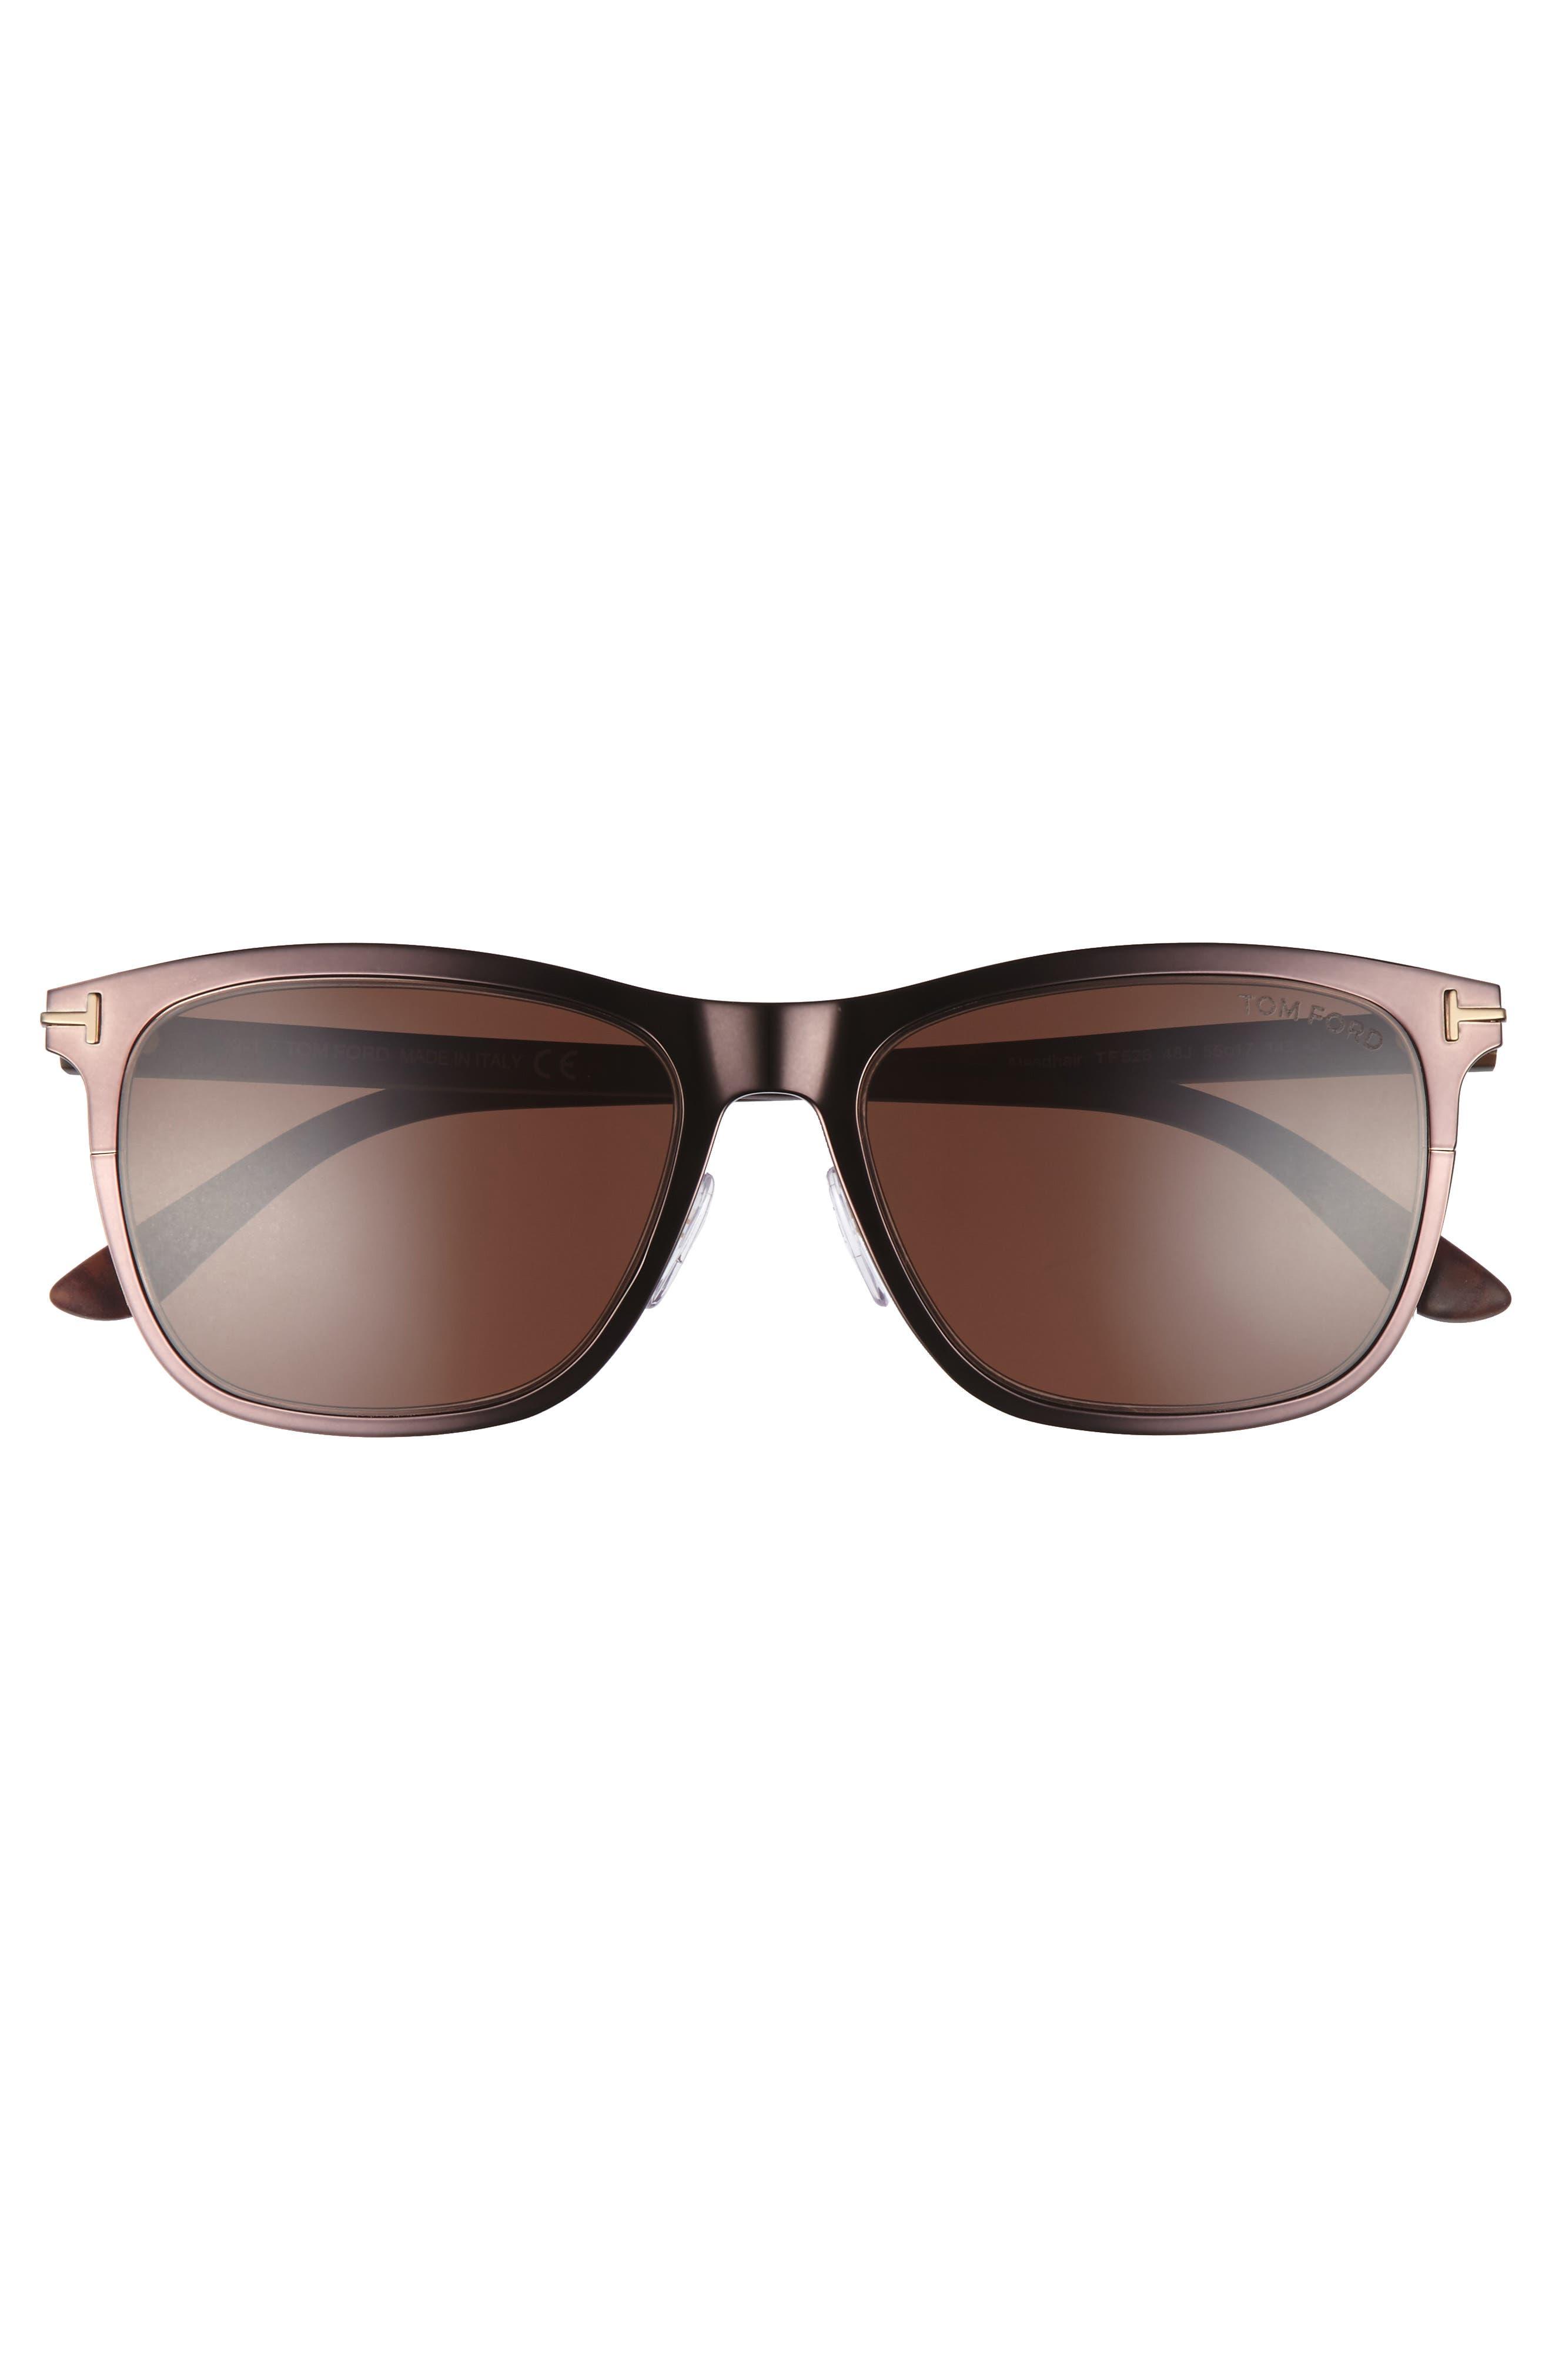 Alasdhair 55mm Sunglasses,                             Alternate thumbnail 2, color,                             SHINY DARK BROWN/ ROVIEX